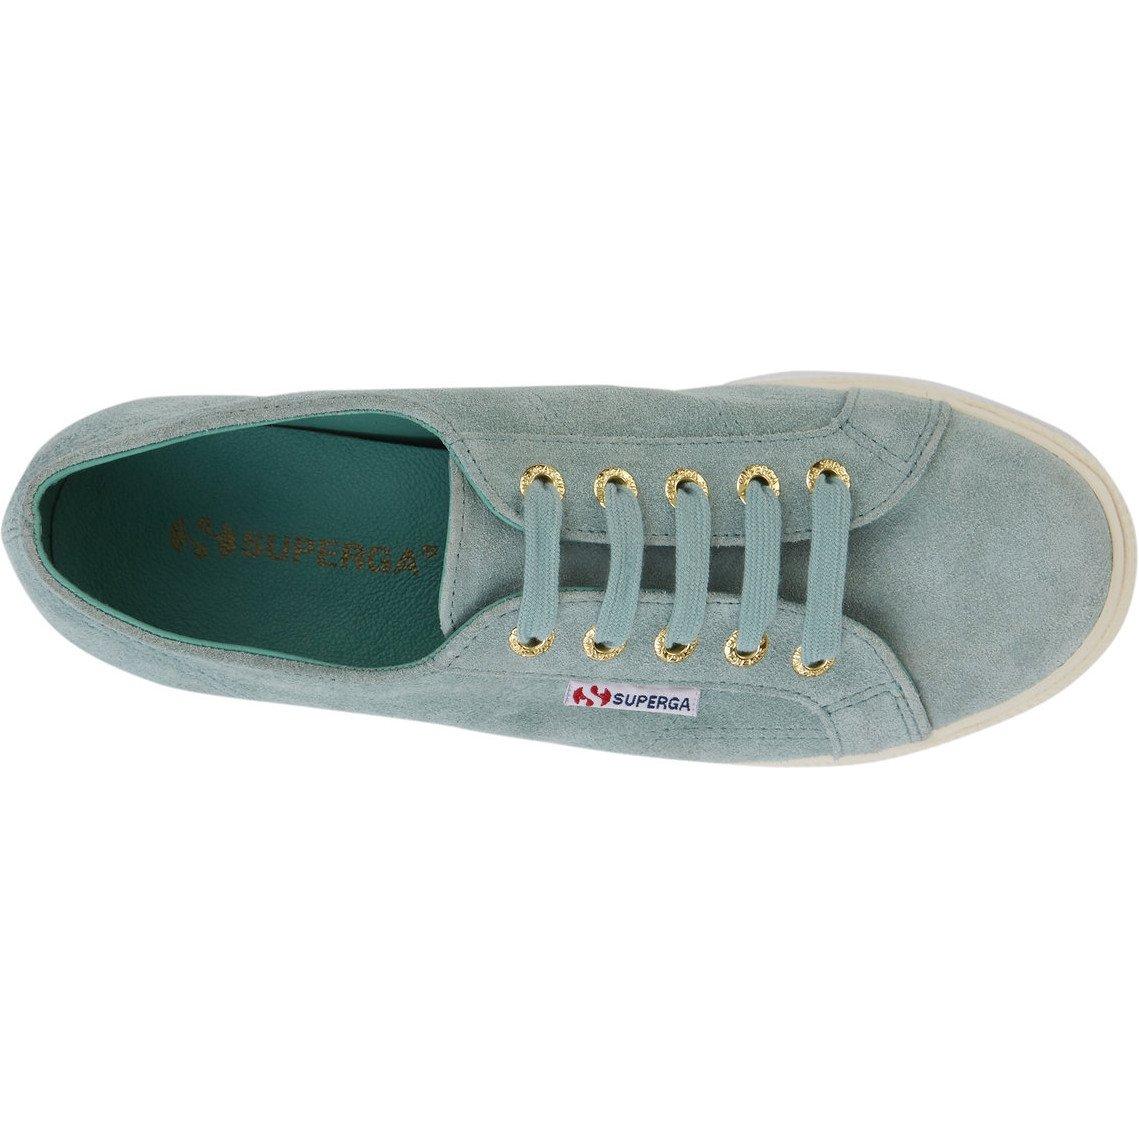 Superga Damen 2790-suew Grün Sneaker, Grün 2790-suew Lt Sage ebb6ff